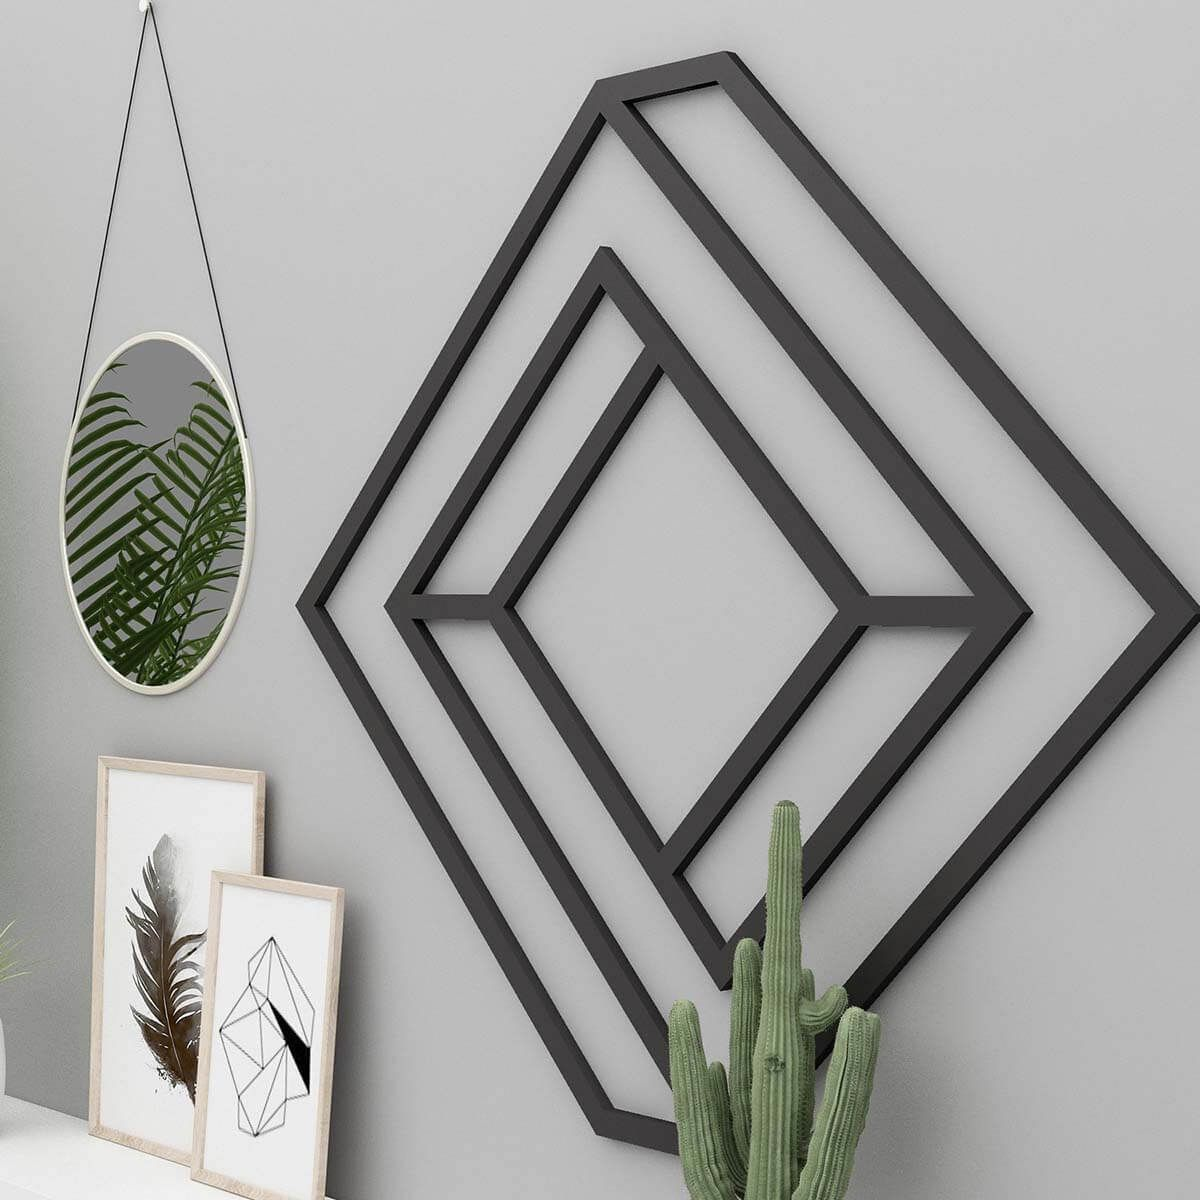 3d geometric metal home decor wall art choose more